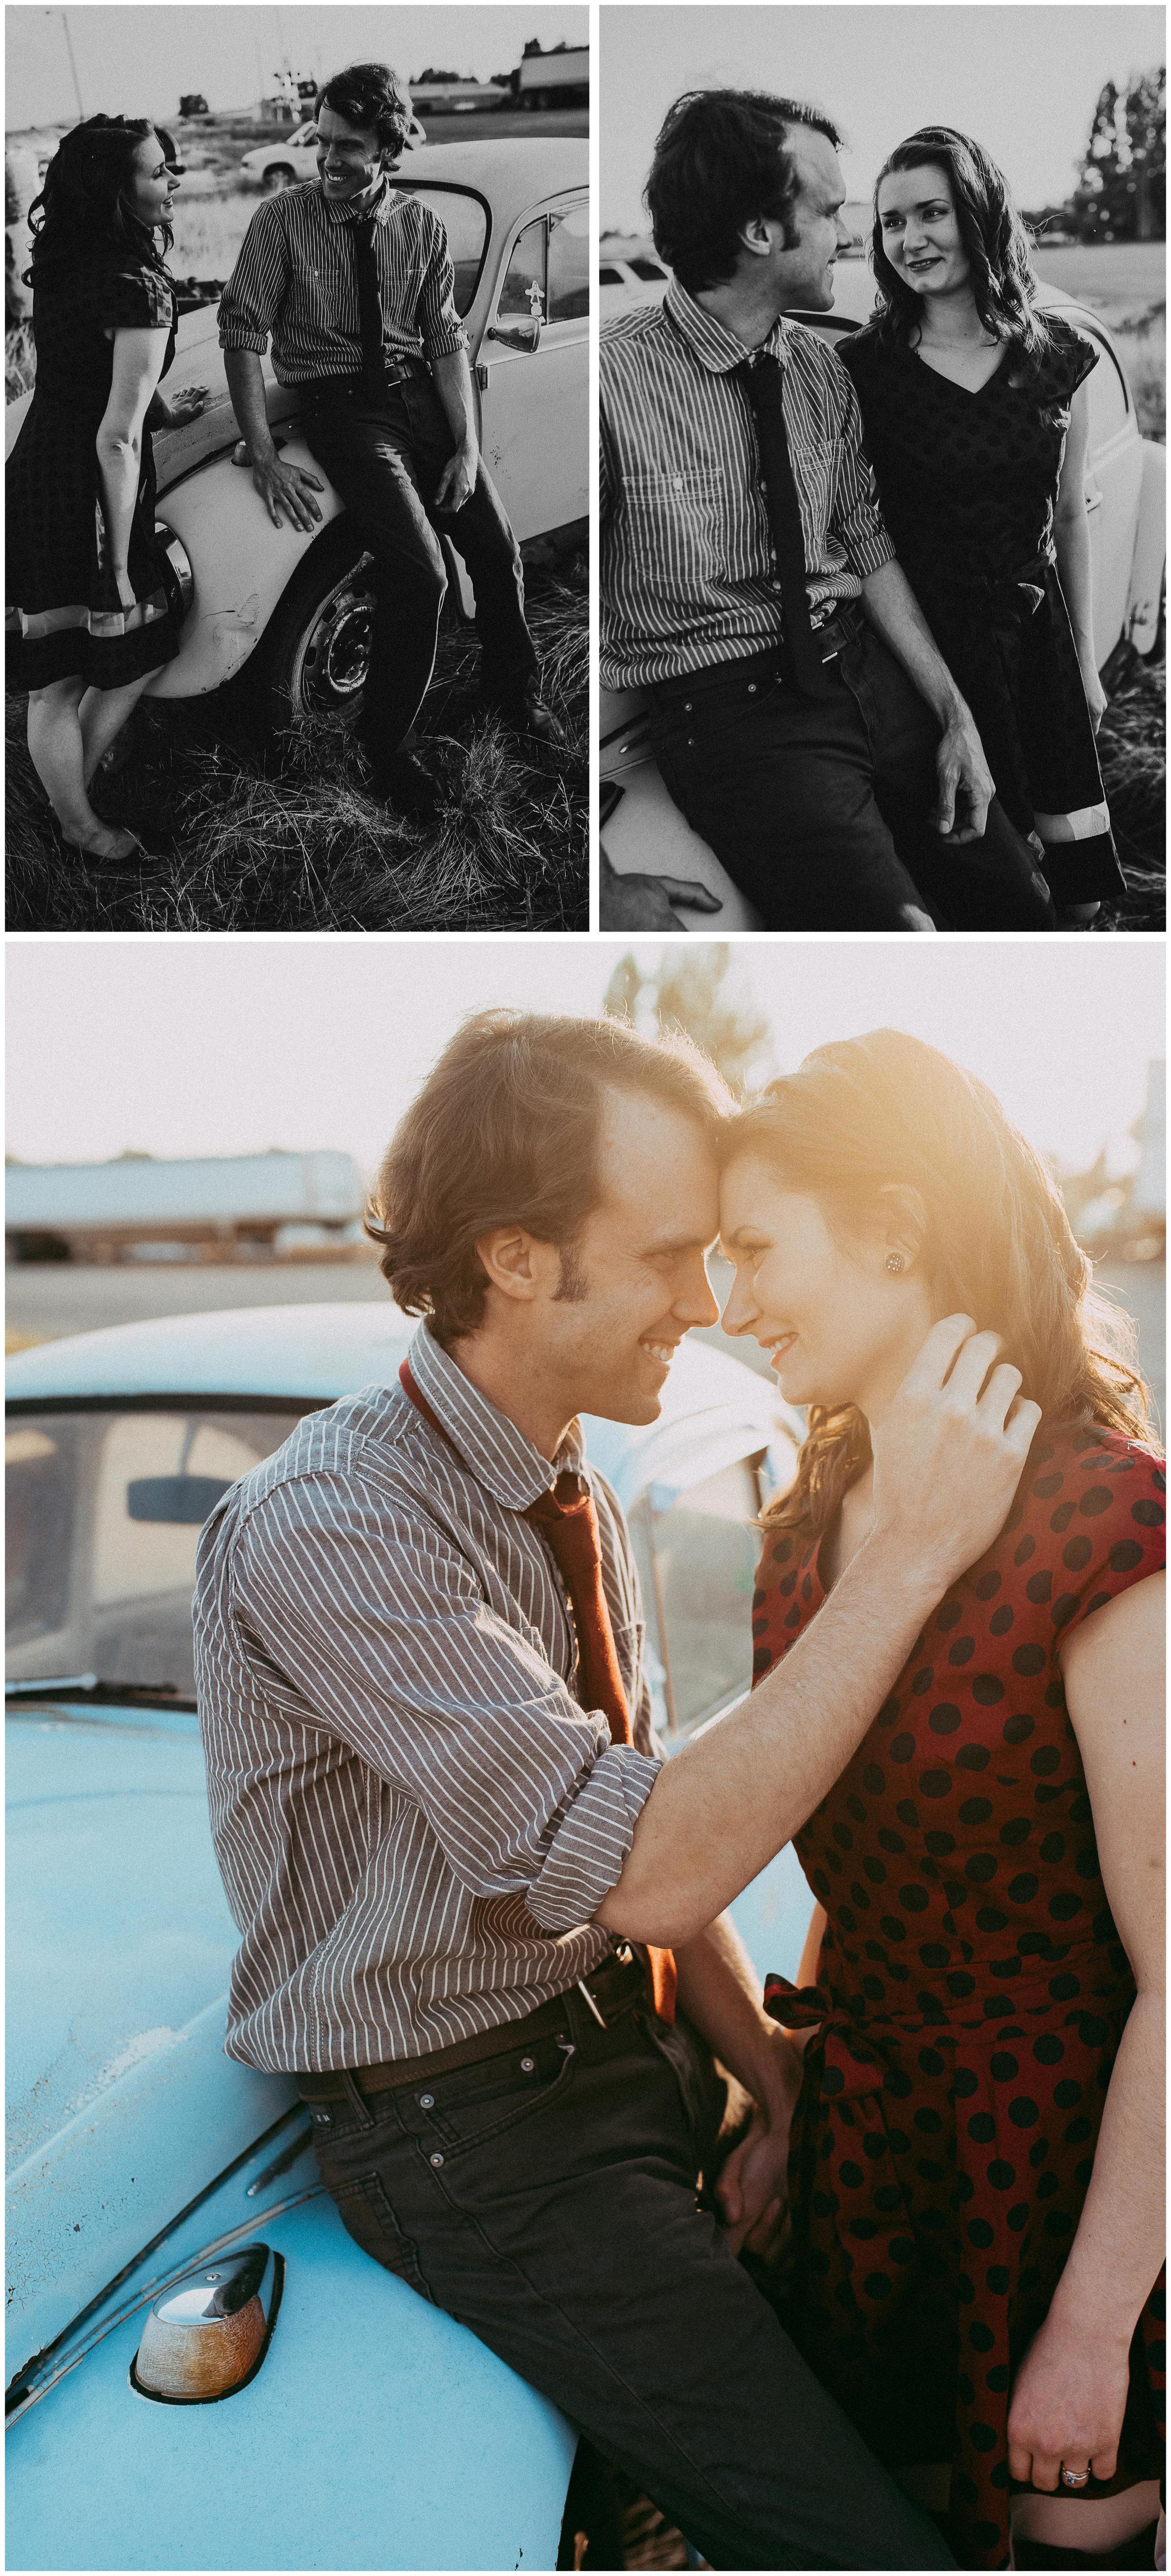 50s Engagement Session. Sagebrush Studio Photography, Shelby Montana.